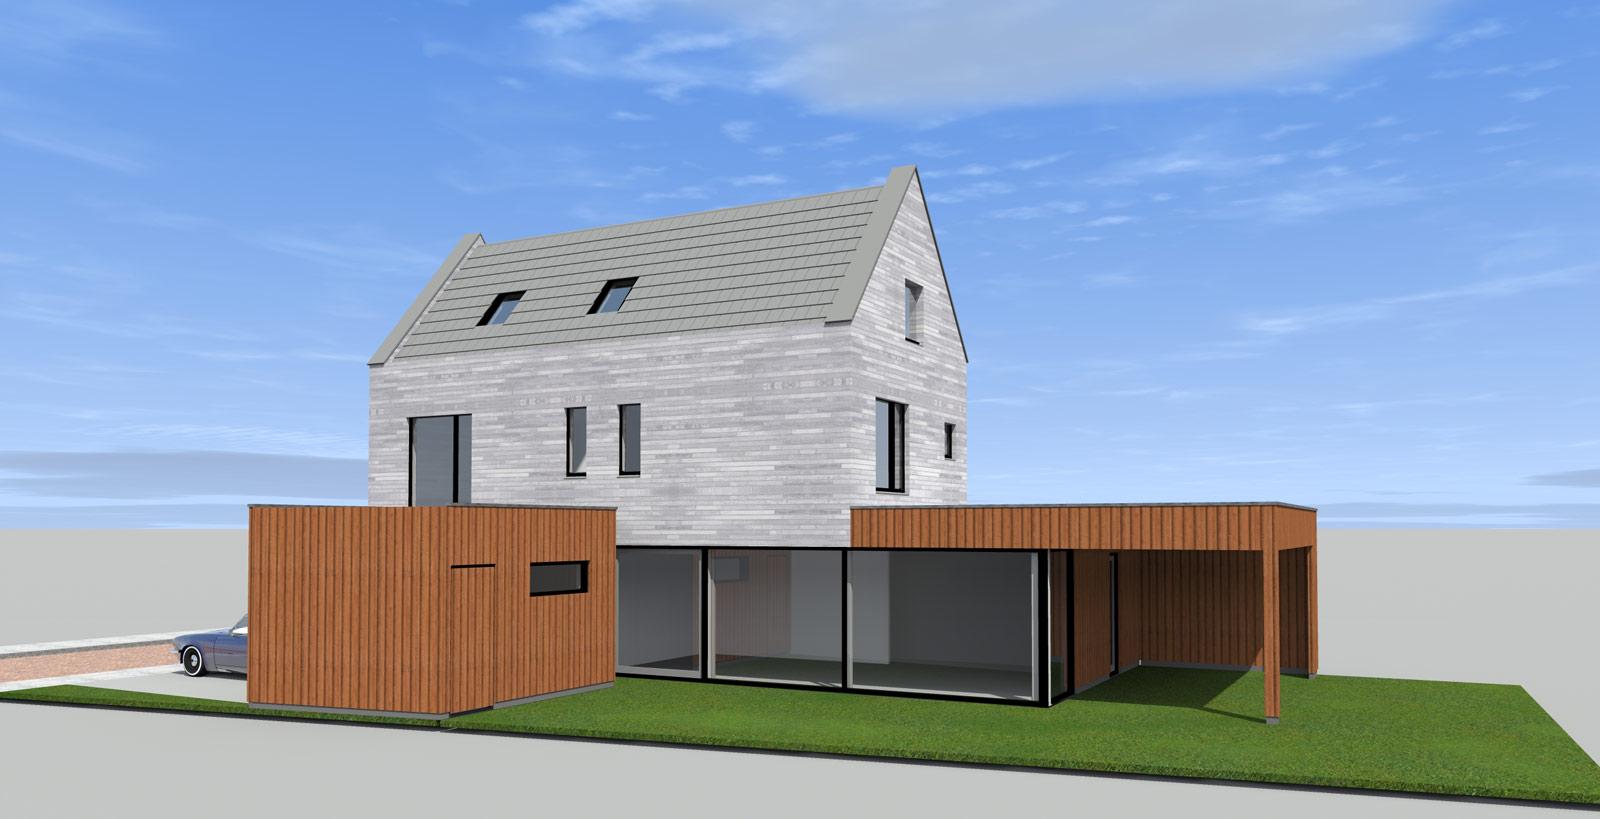 Stadsvilla Enschede Boddenkamp linkerzijgevel in 3D